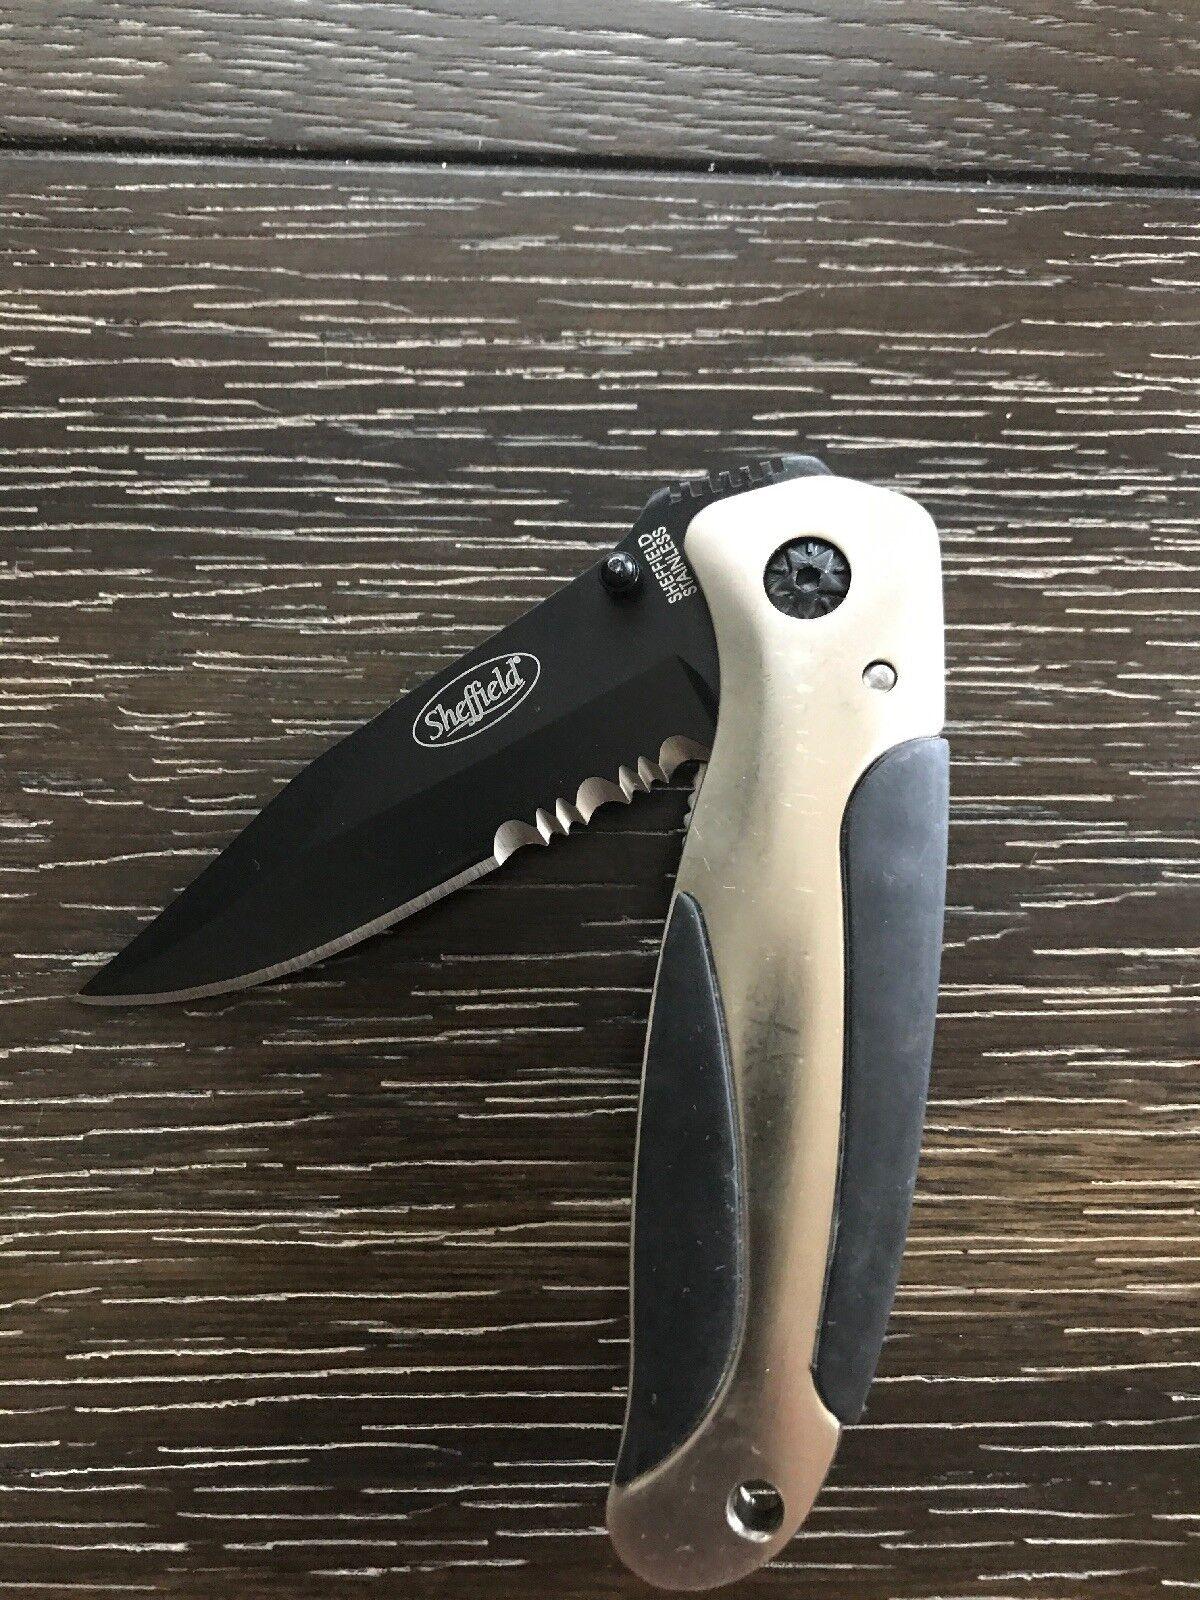 Sheffield Combination Folding Pocket Knife Liner Lock w/ Clip